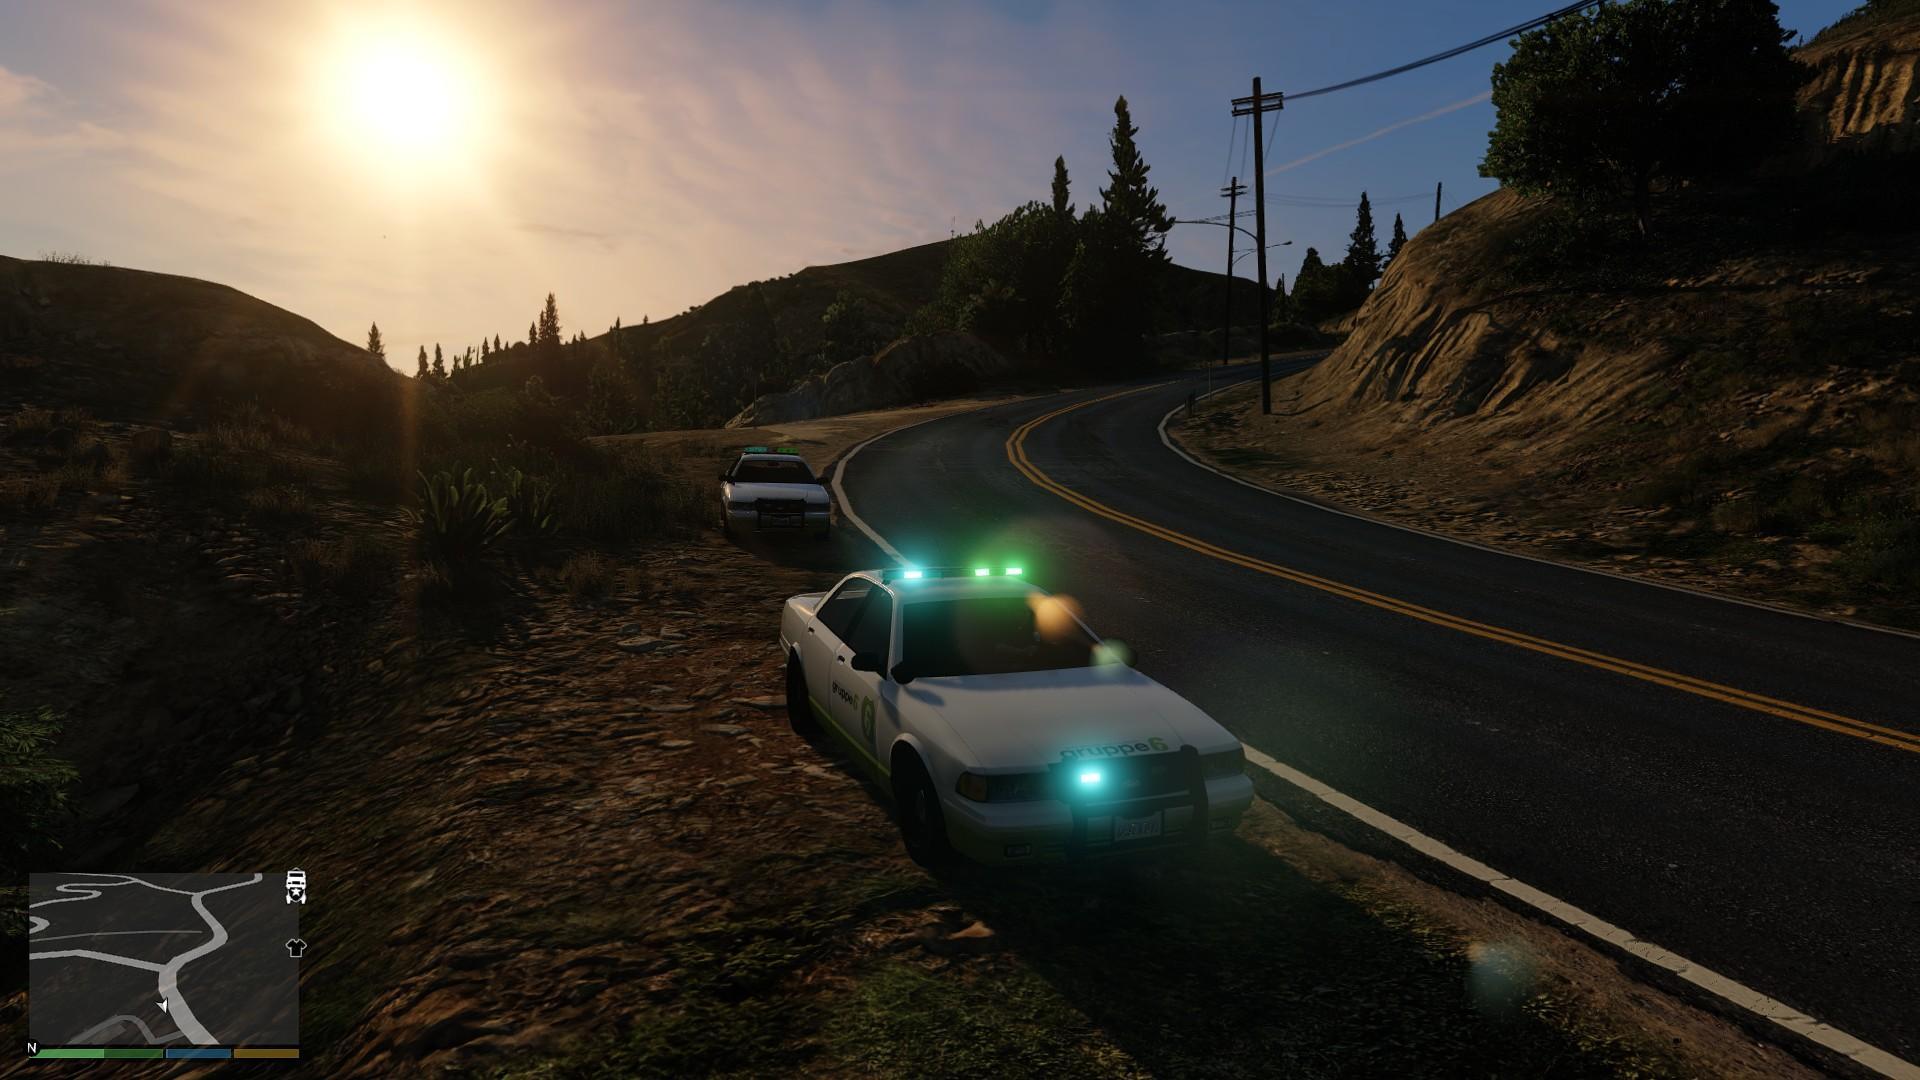 group 6 security vehicle  sheriff